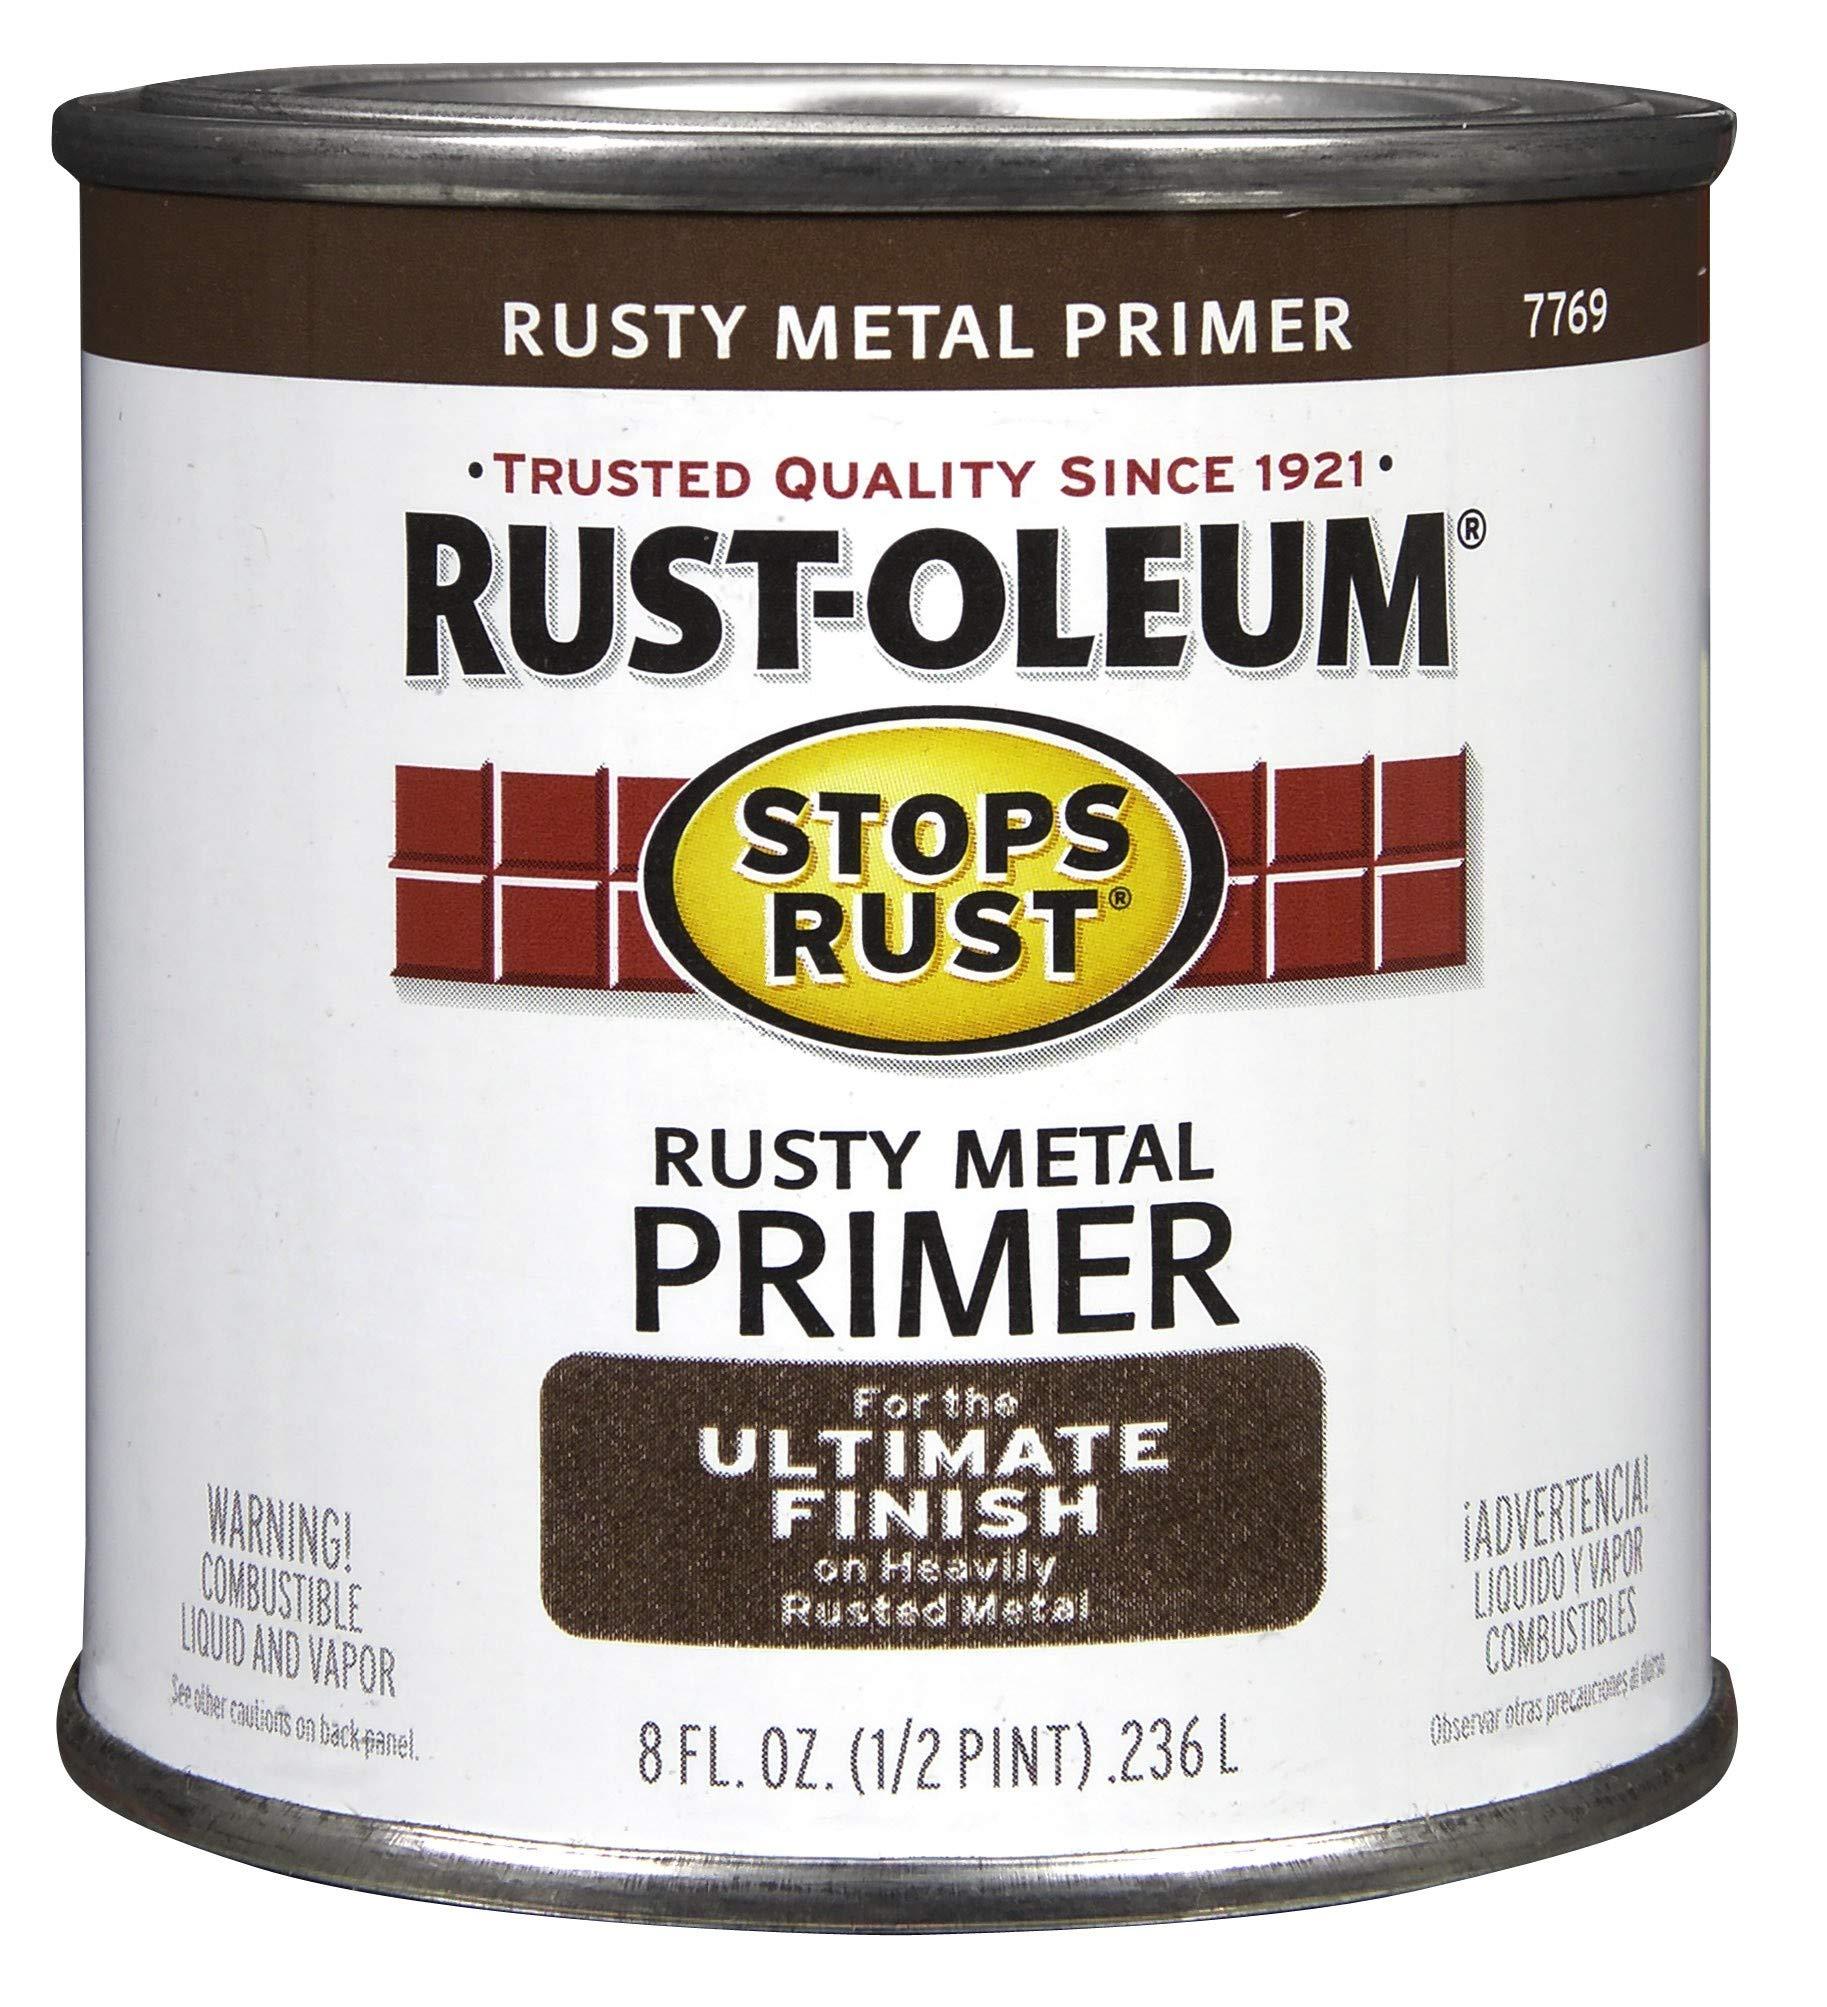 Rust-Oleum 7769730 High Performance Rusty Metal Primer